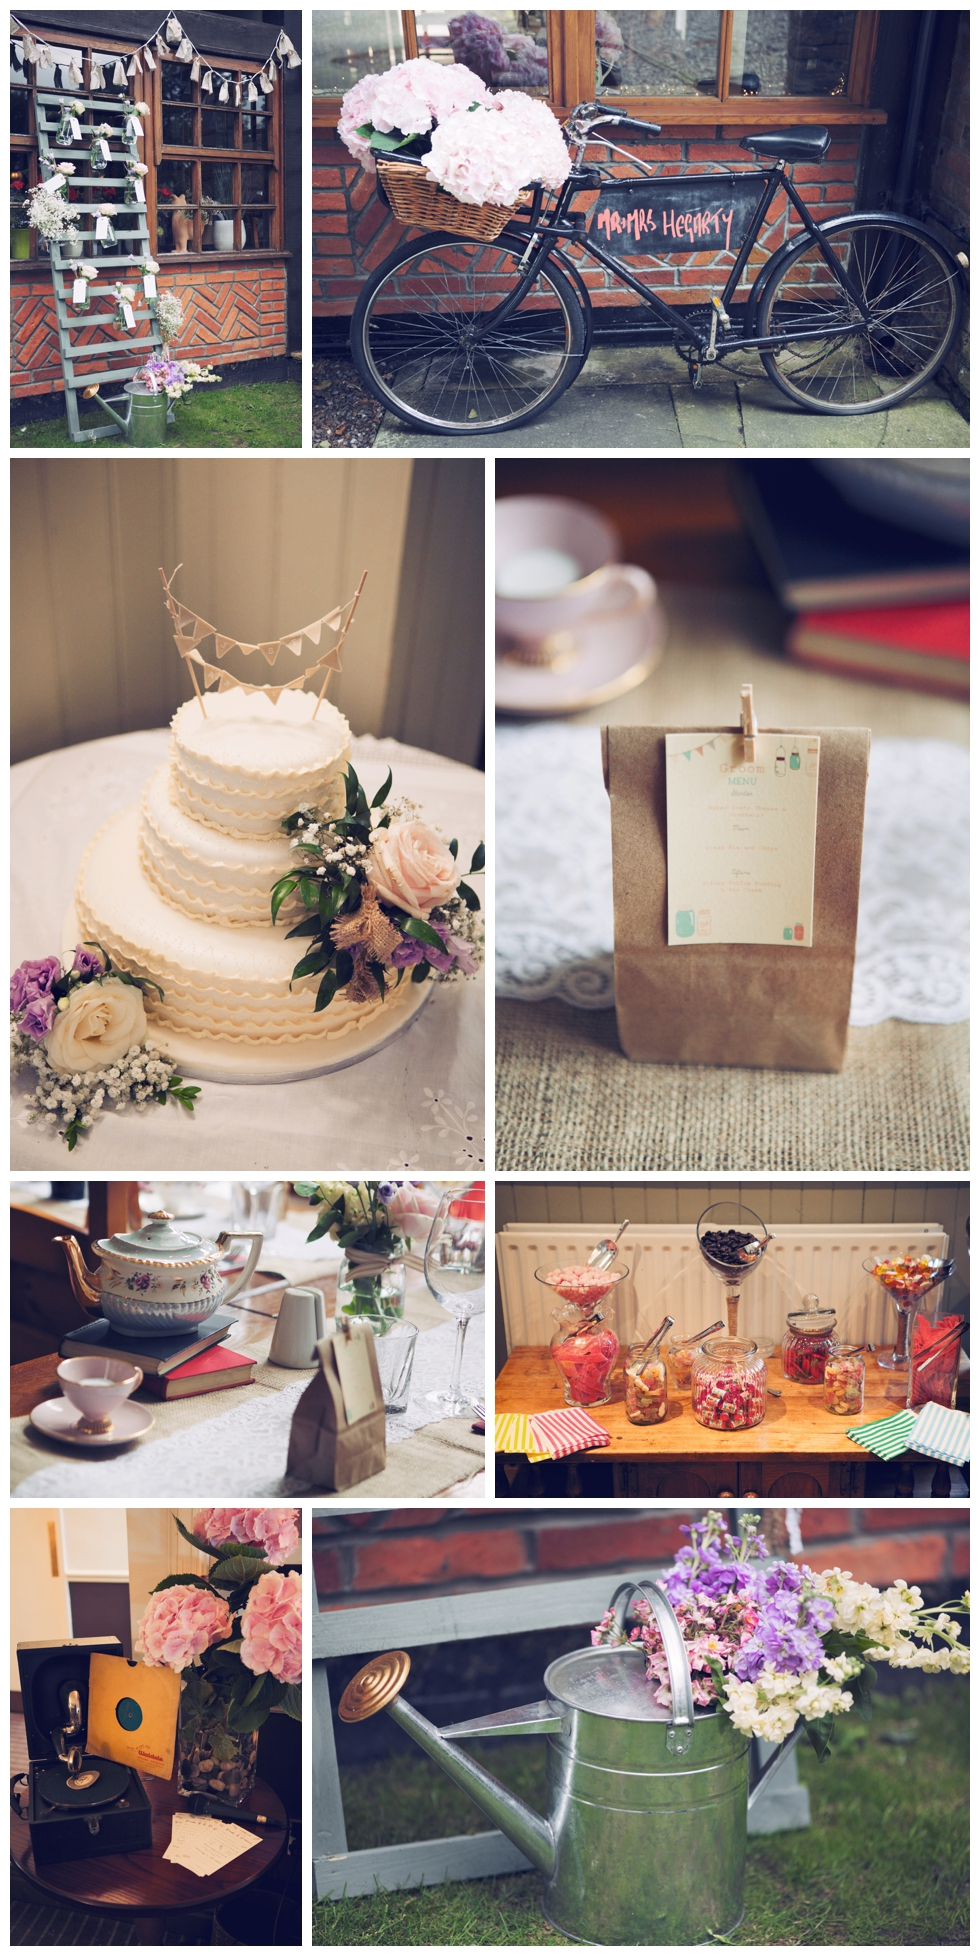 Delamere wedding Photographer